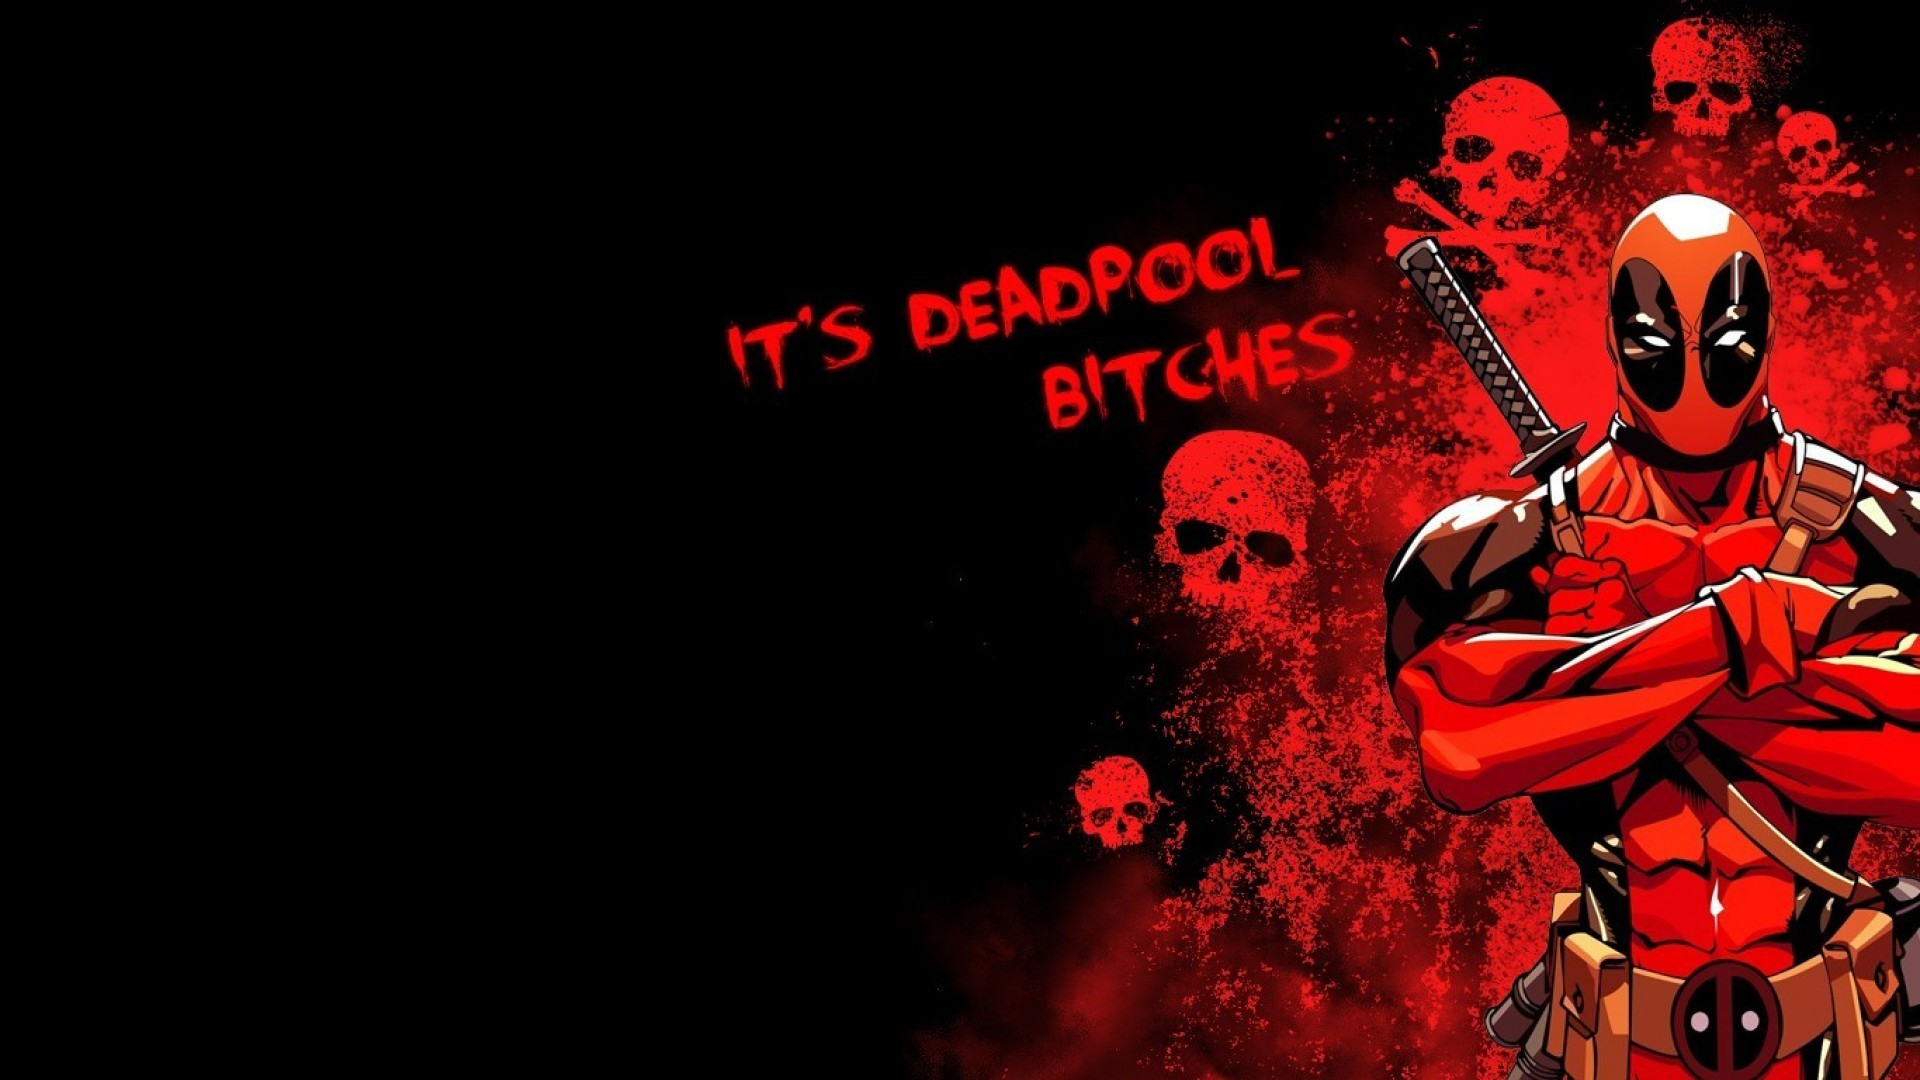 Deadpool Widescreen Wallpaper Funny Deadpool Wallpaper